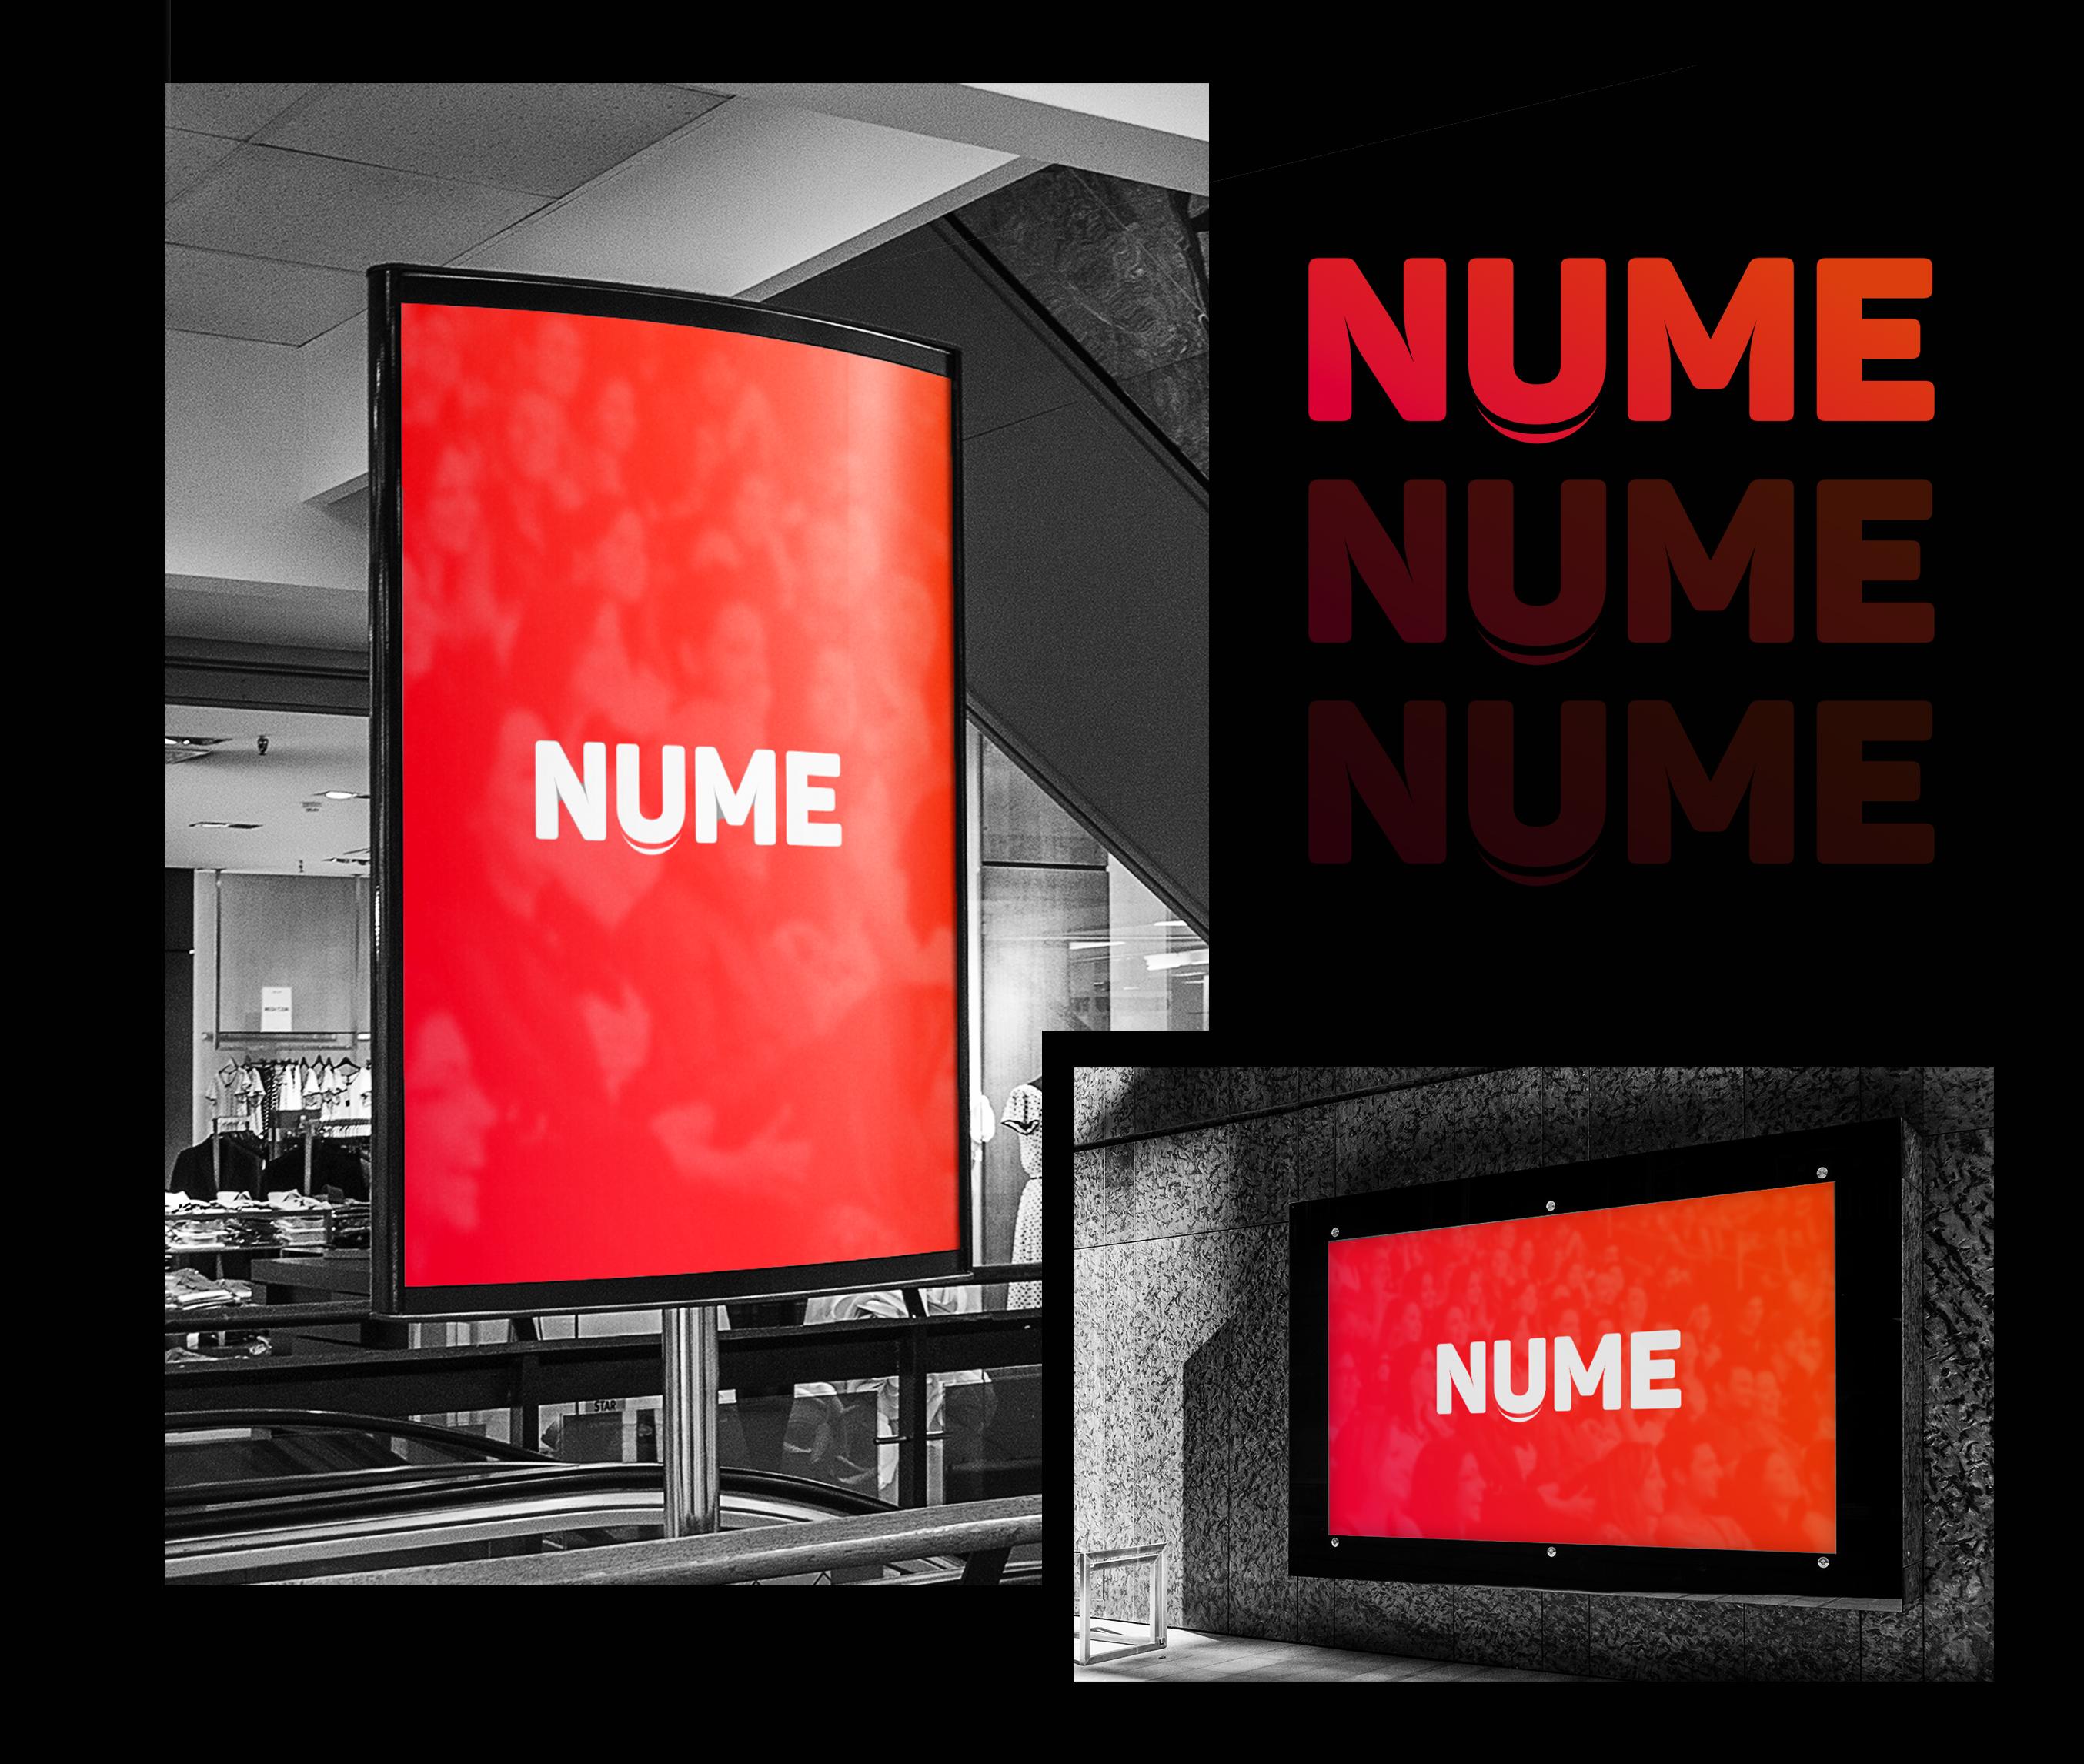 Nume3